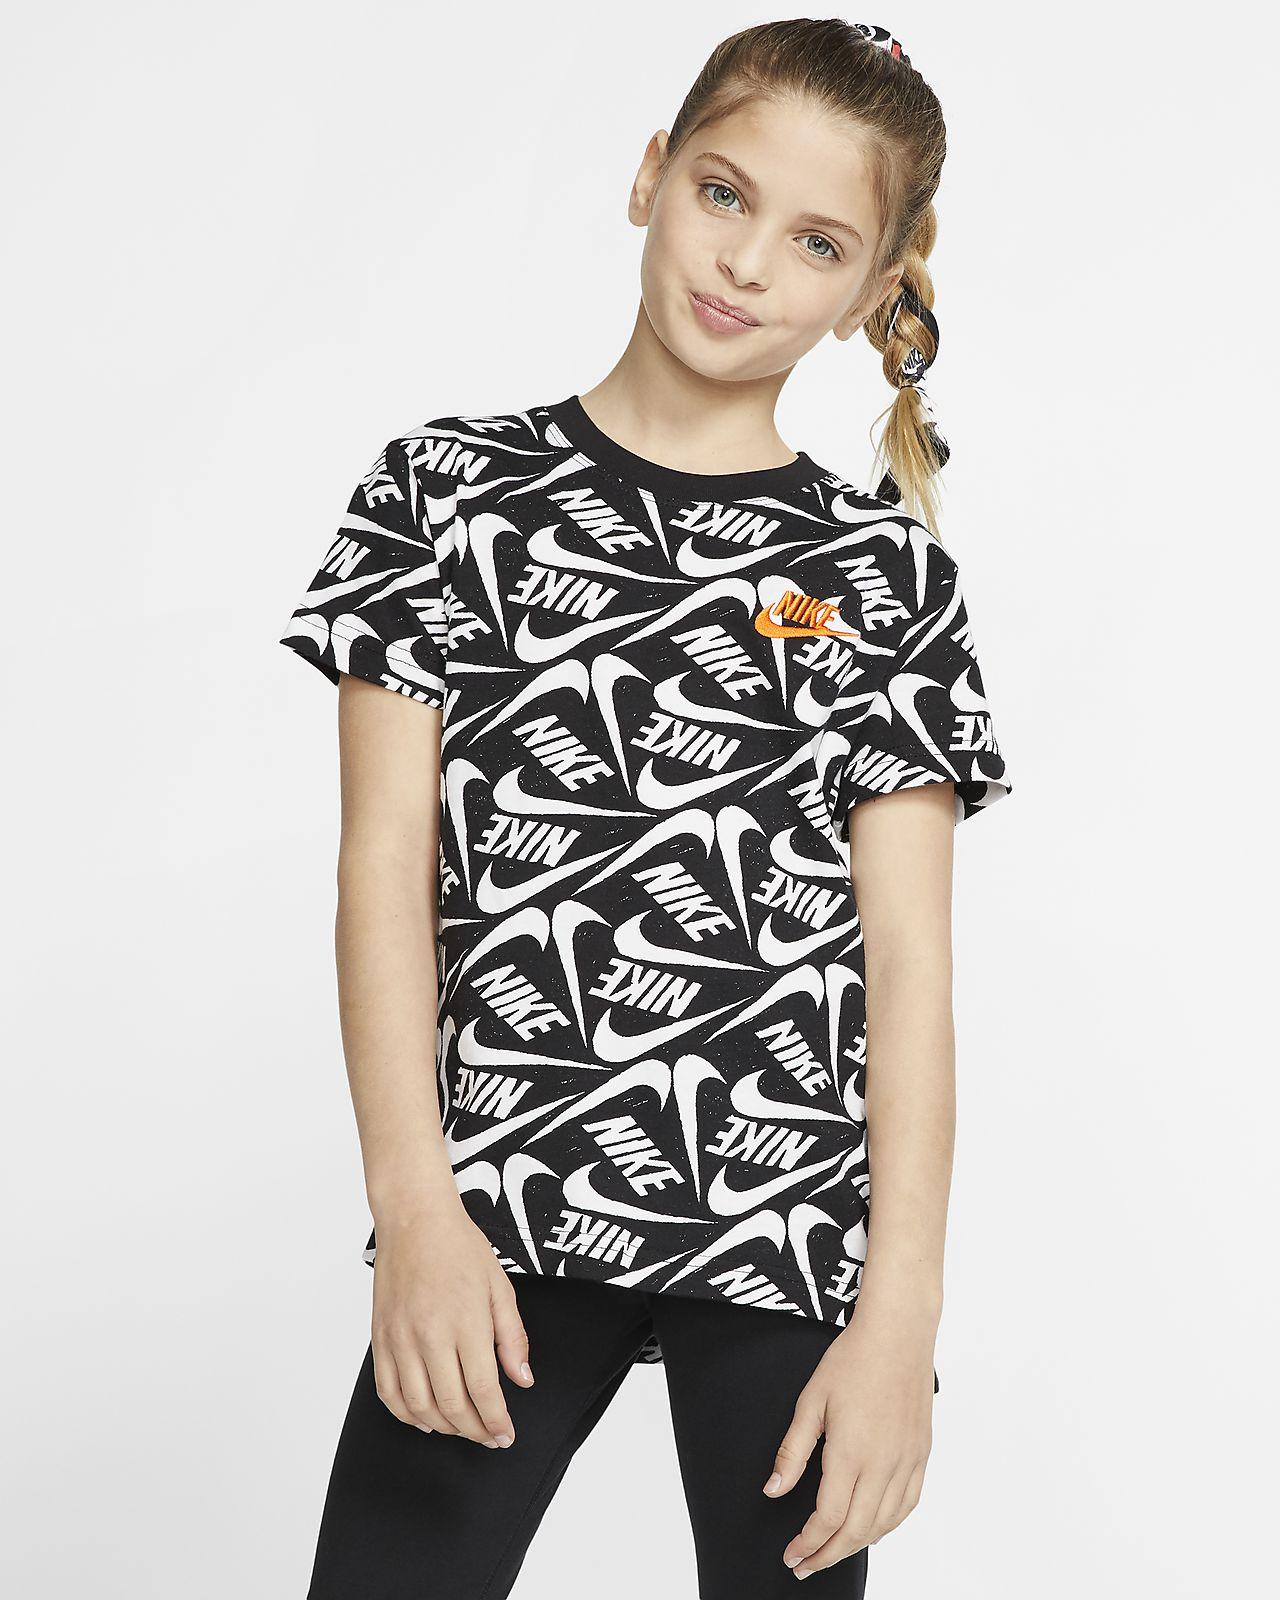 Nike Sportswear Big Kids' (Girls') Printed T Shirt